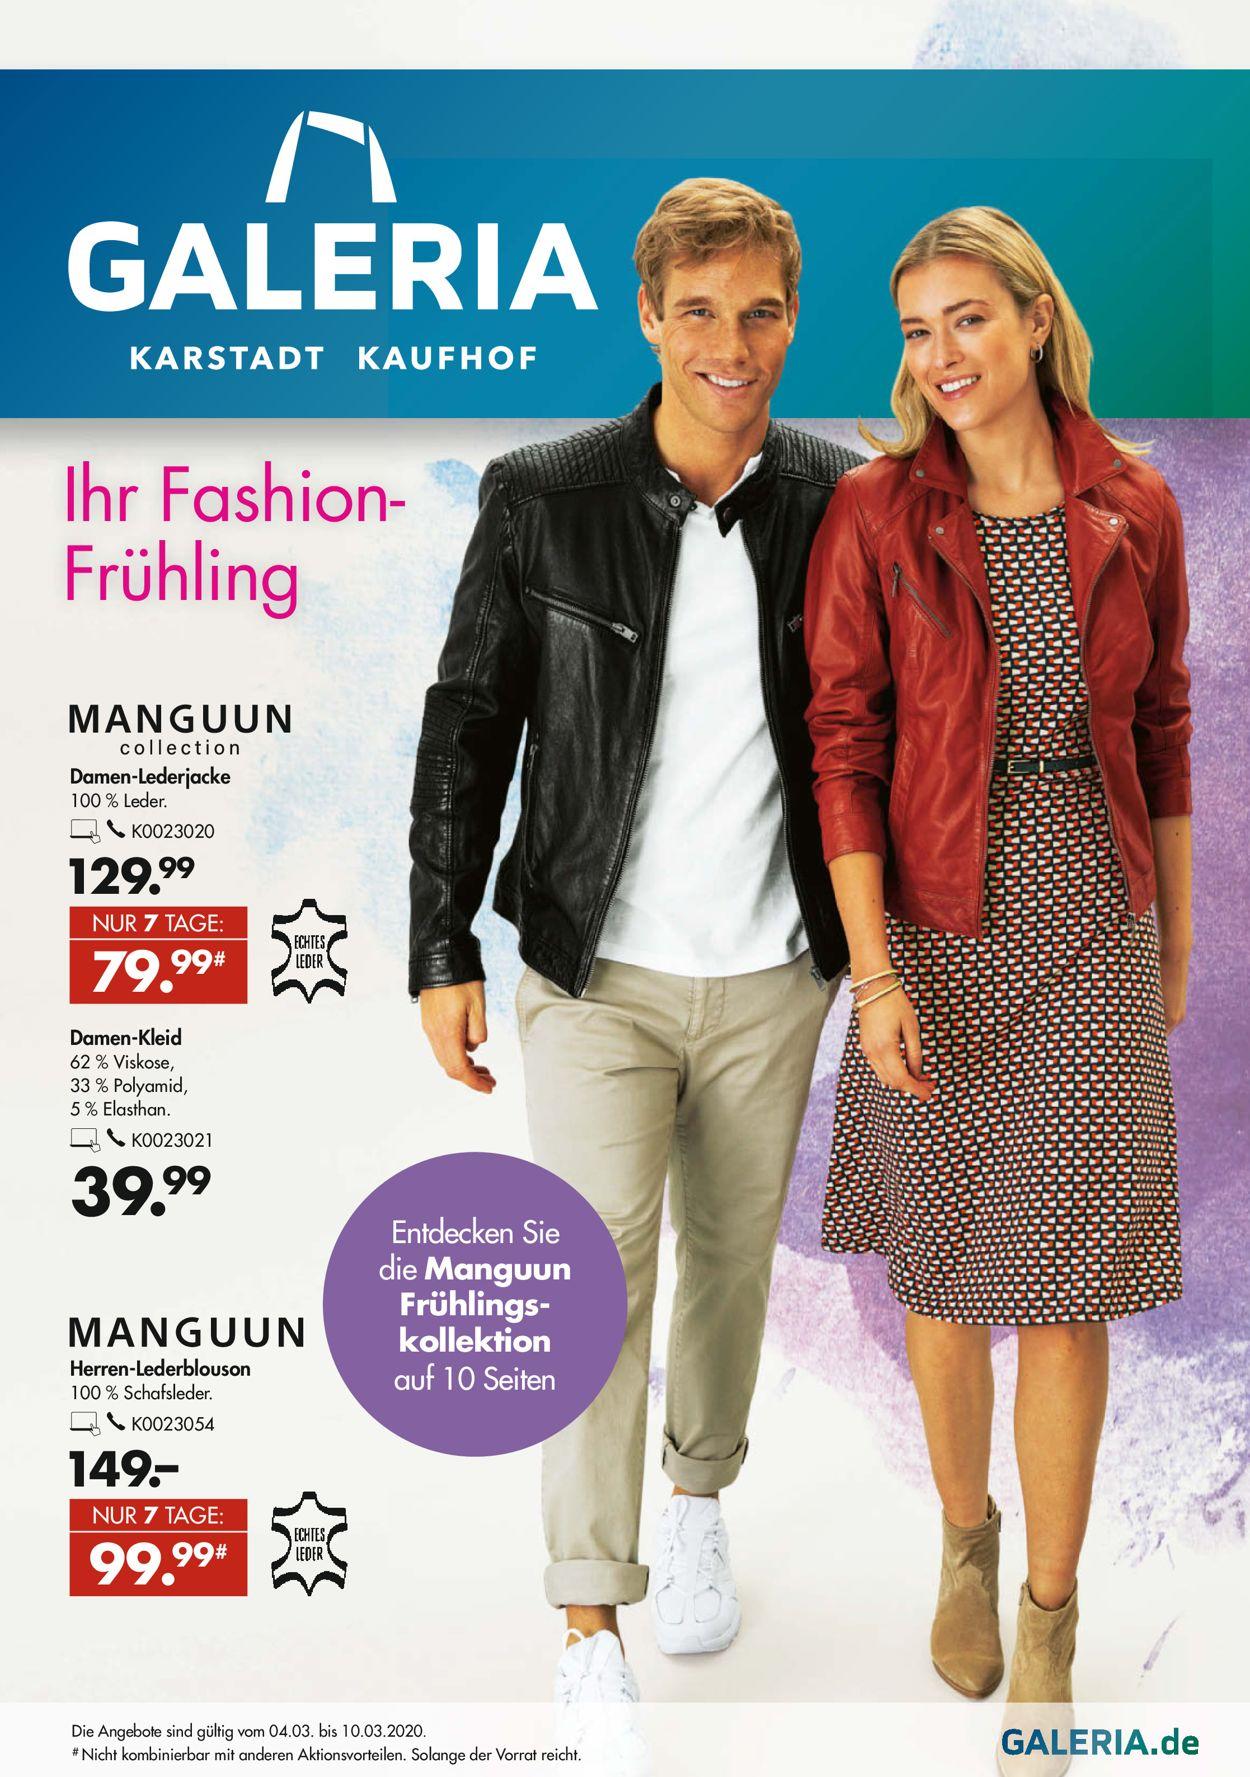 GALERIA Kaufhof Prospekt - Aktuell vom 04.03-10.03.2020